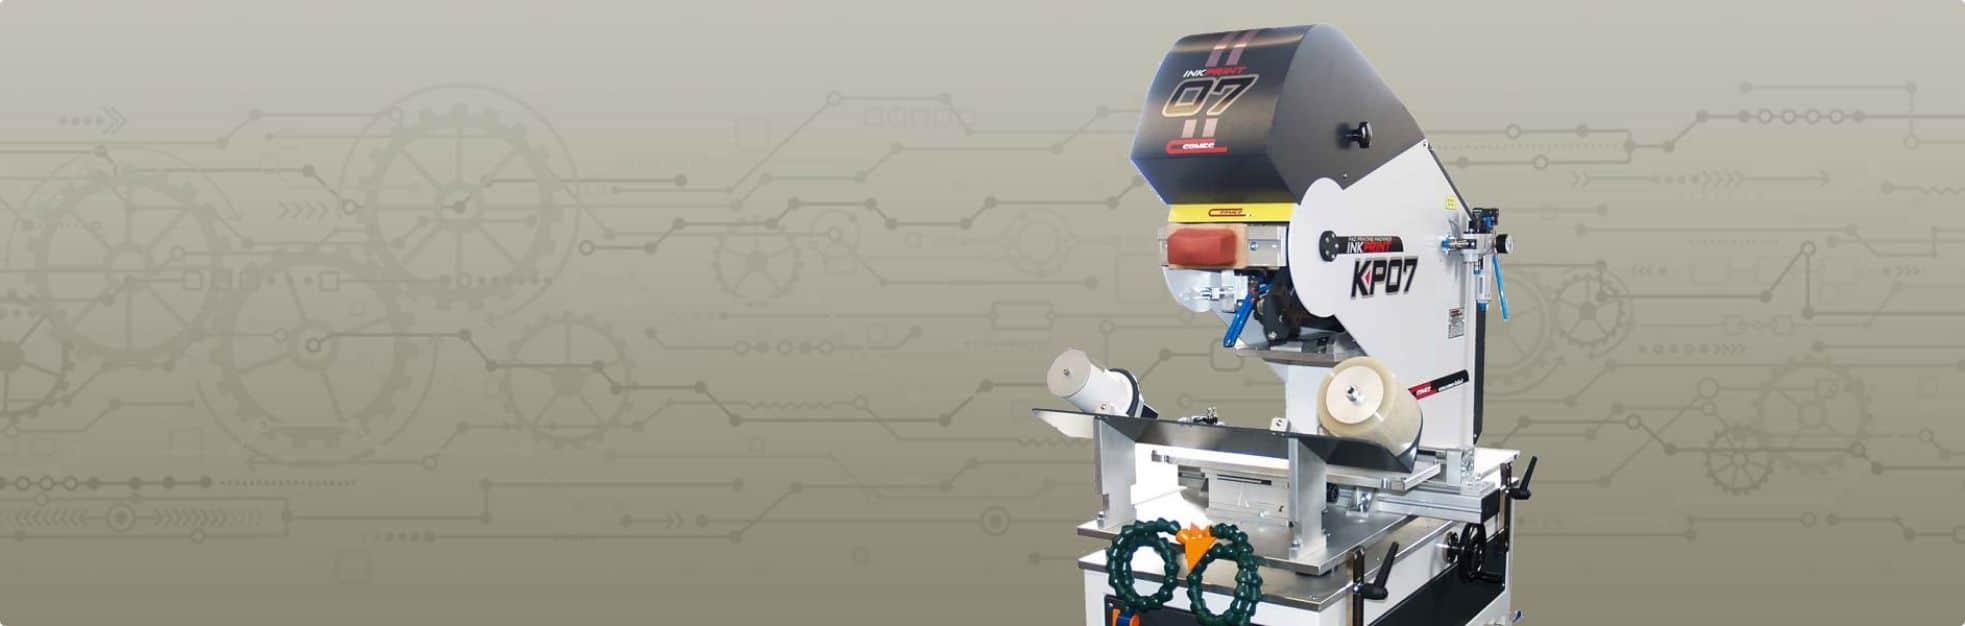 KP07 Pad Printing Machine